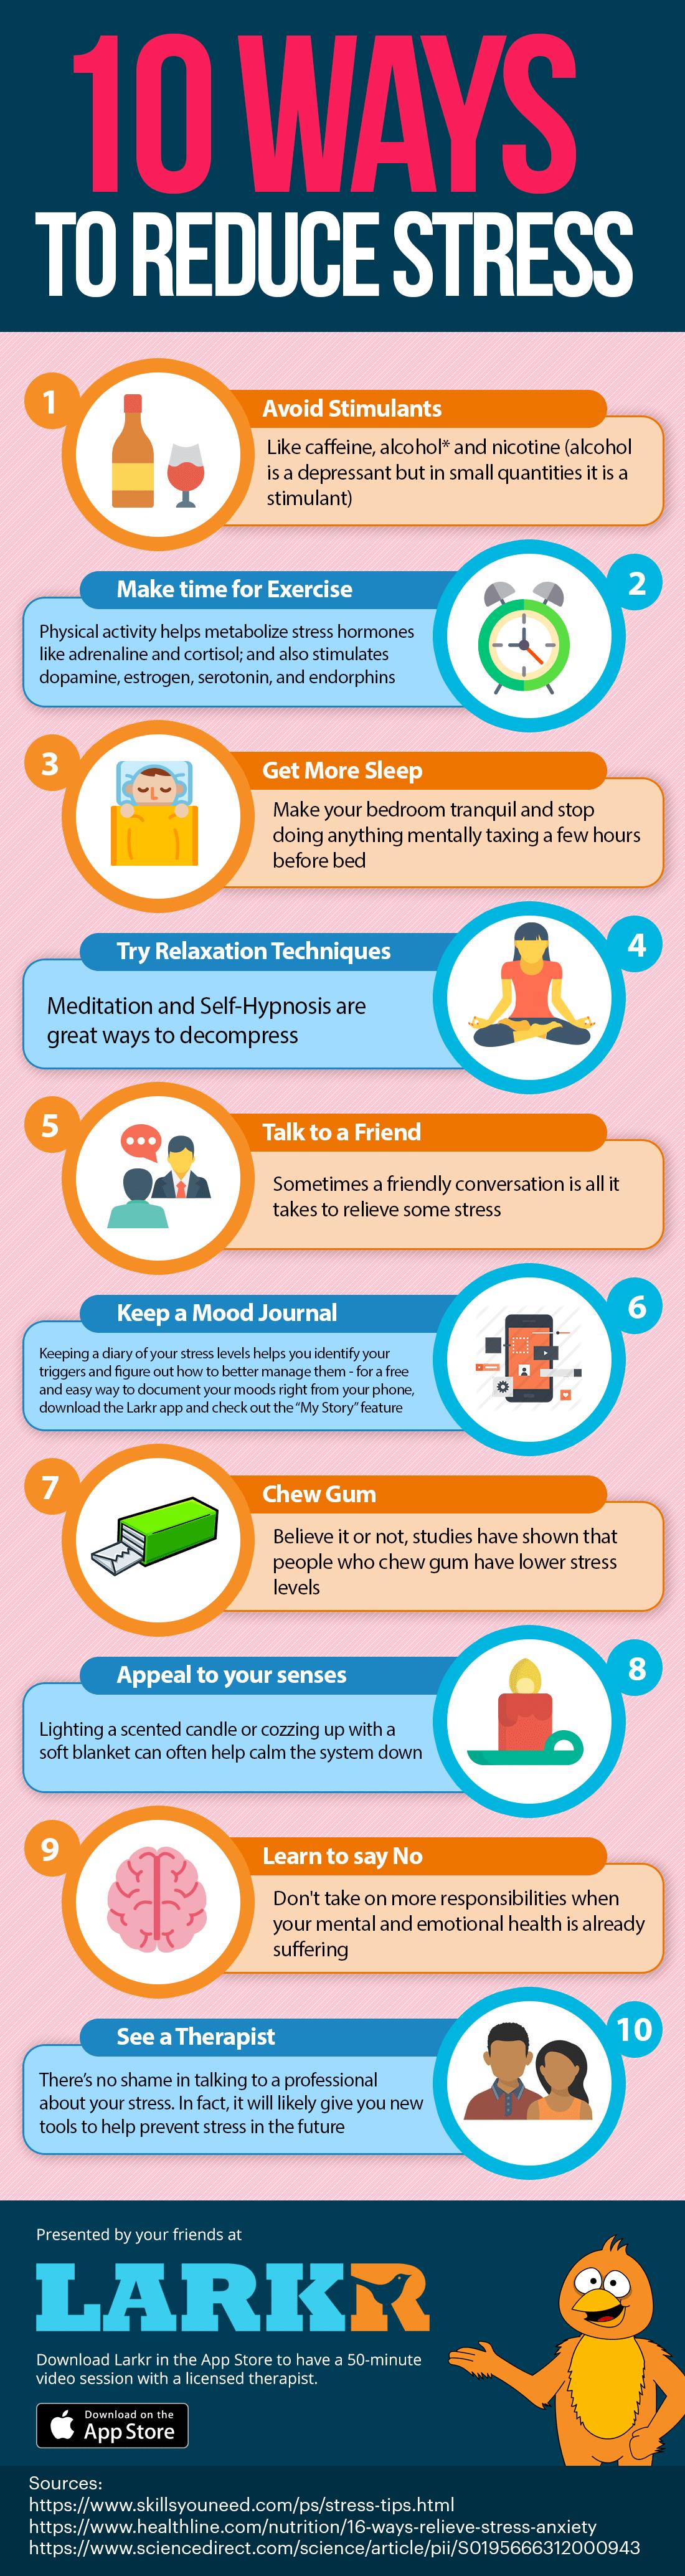 10 Simple Ways To Reduce Stress